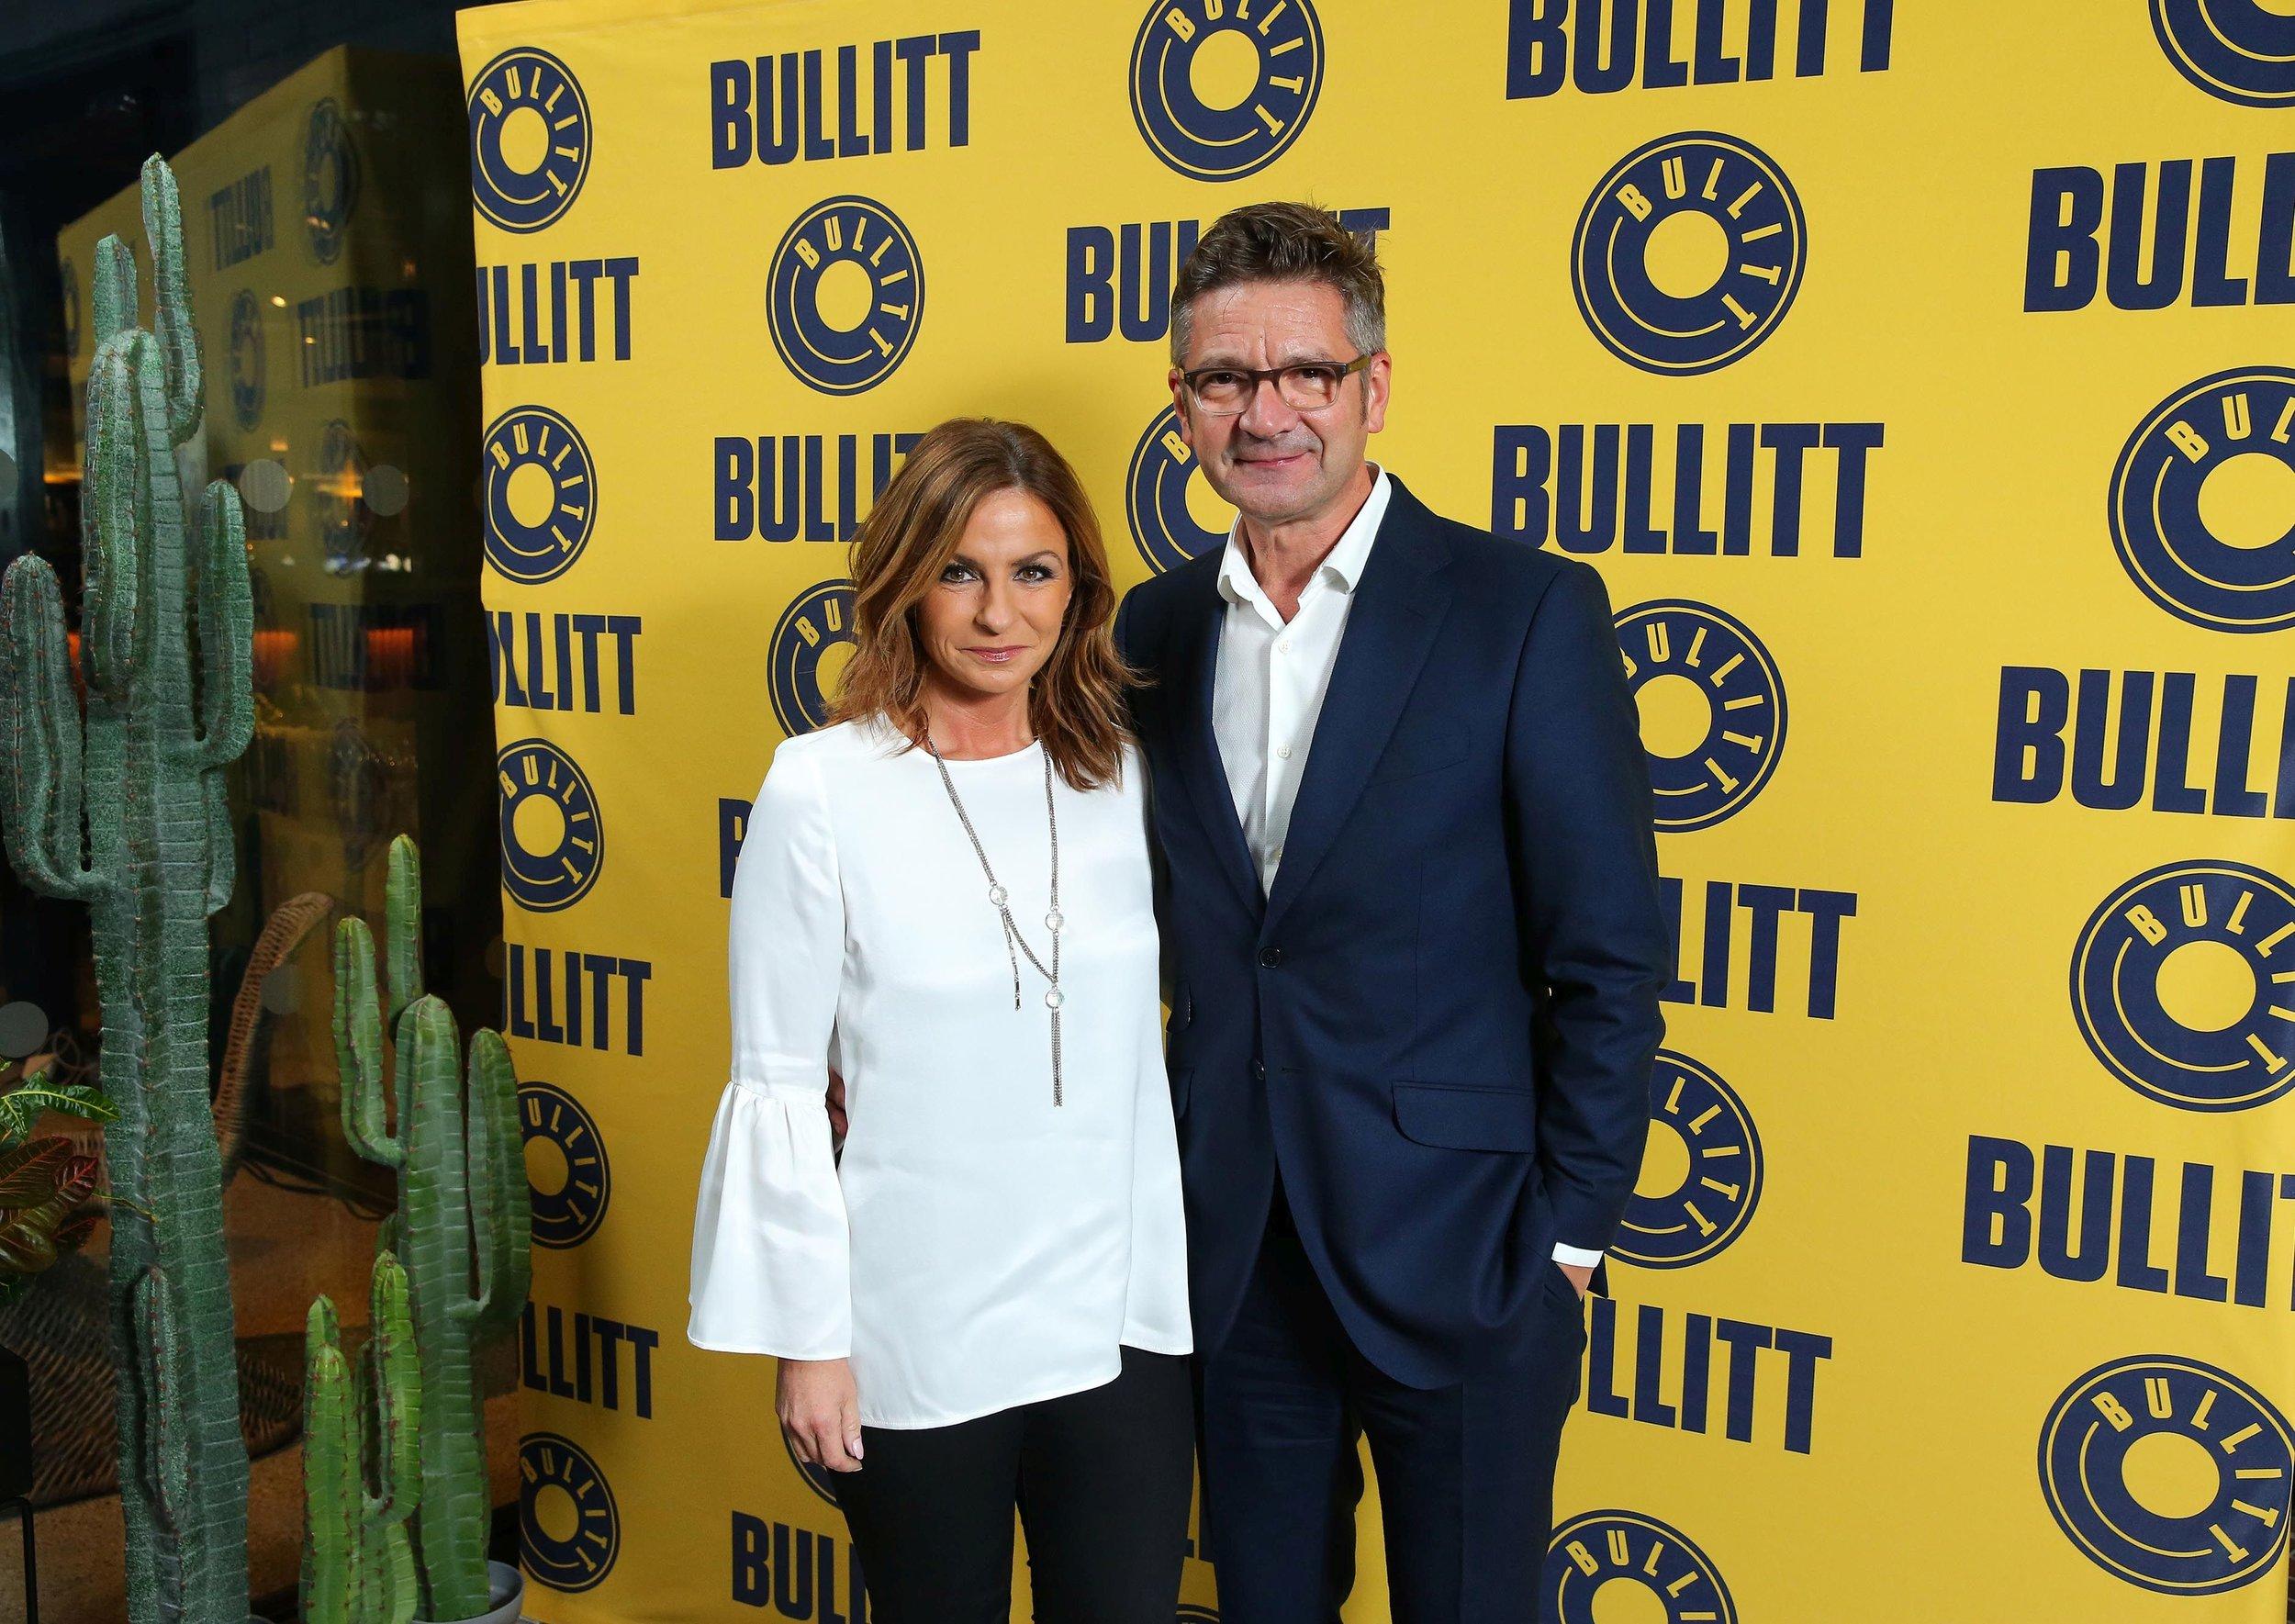 Bullitt Launch Socials 23.JPG